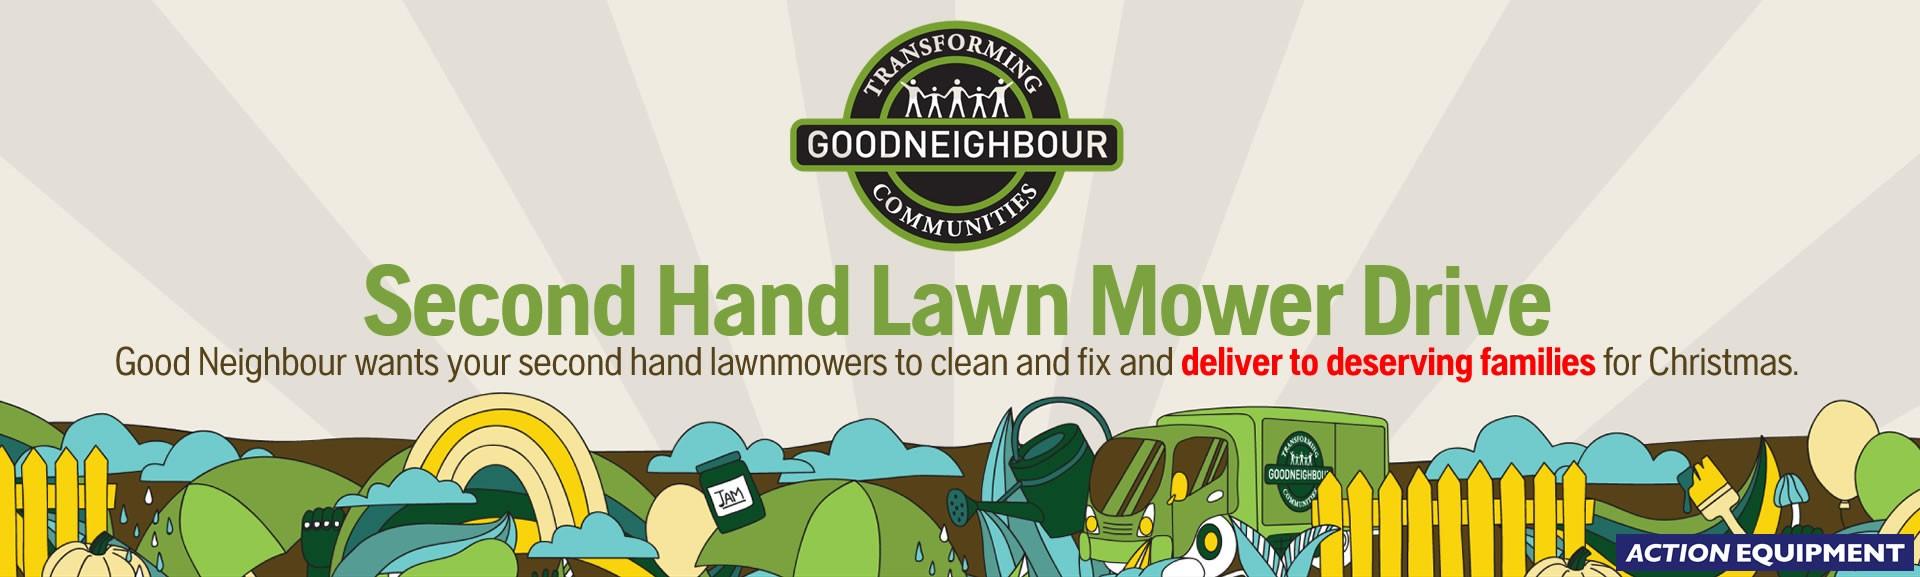 Good Neighbour - lawn mower donation drive